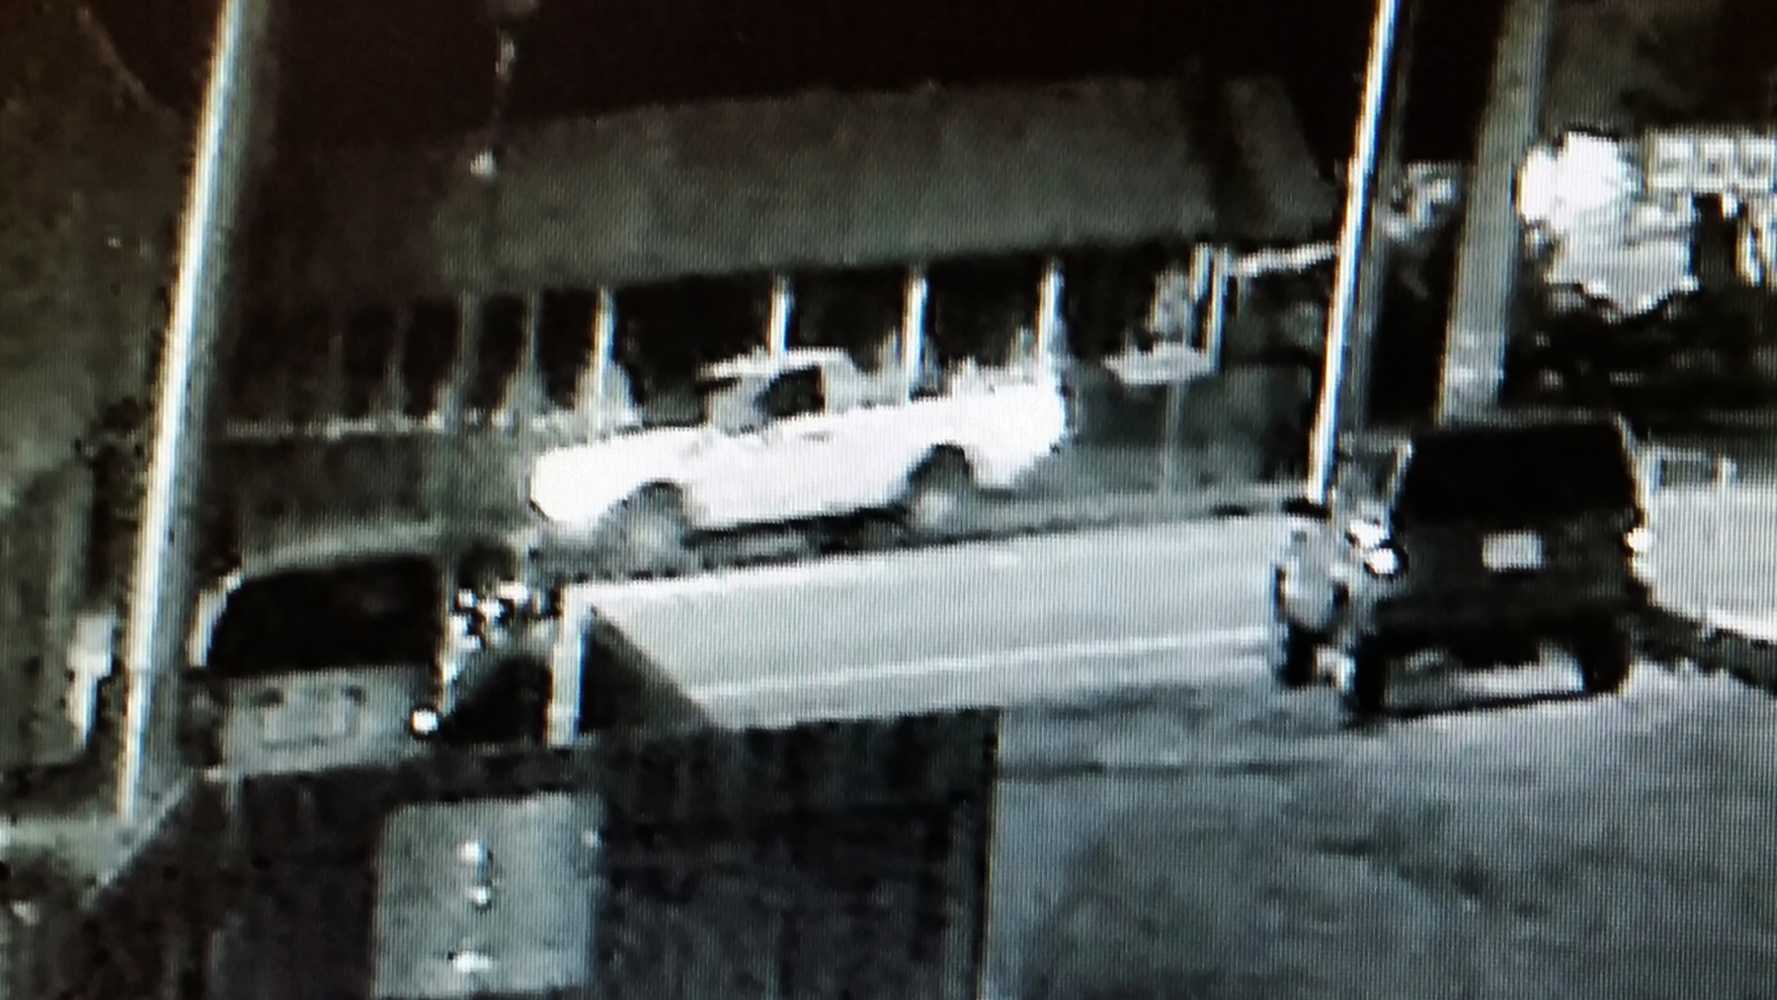 A pickup truck that killed a Santa Cruz man is seen in this surveillance image.